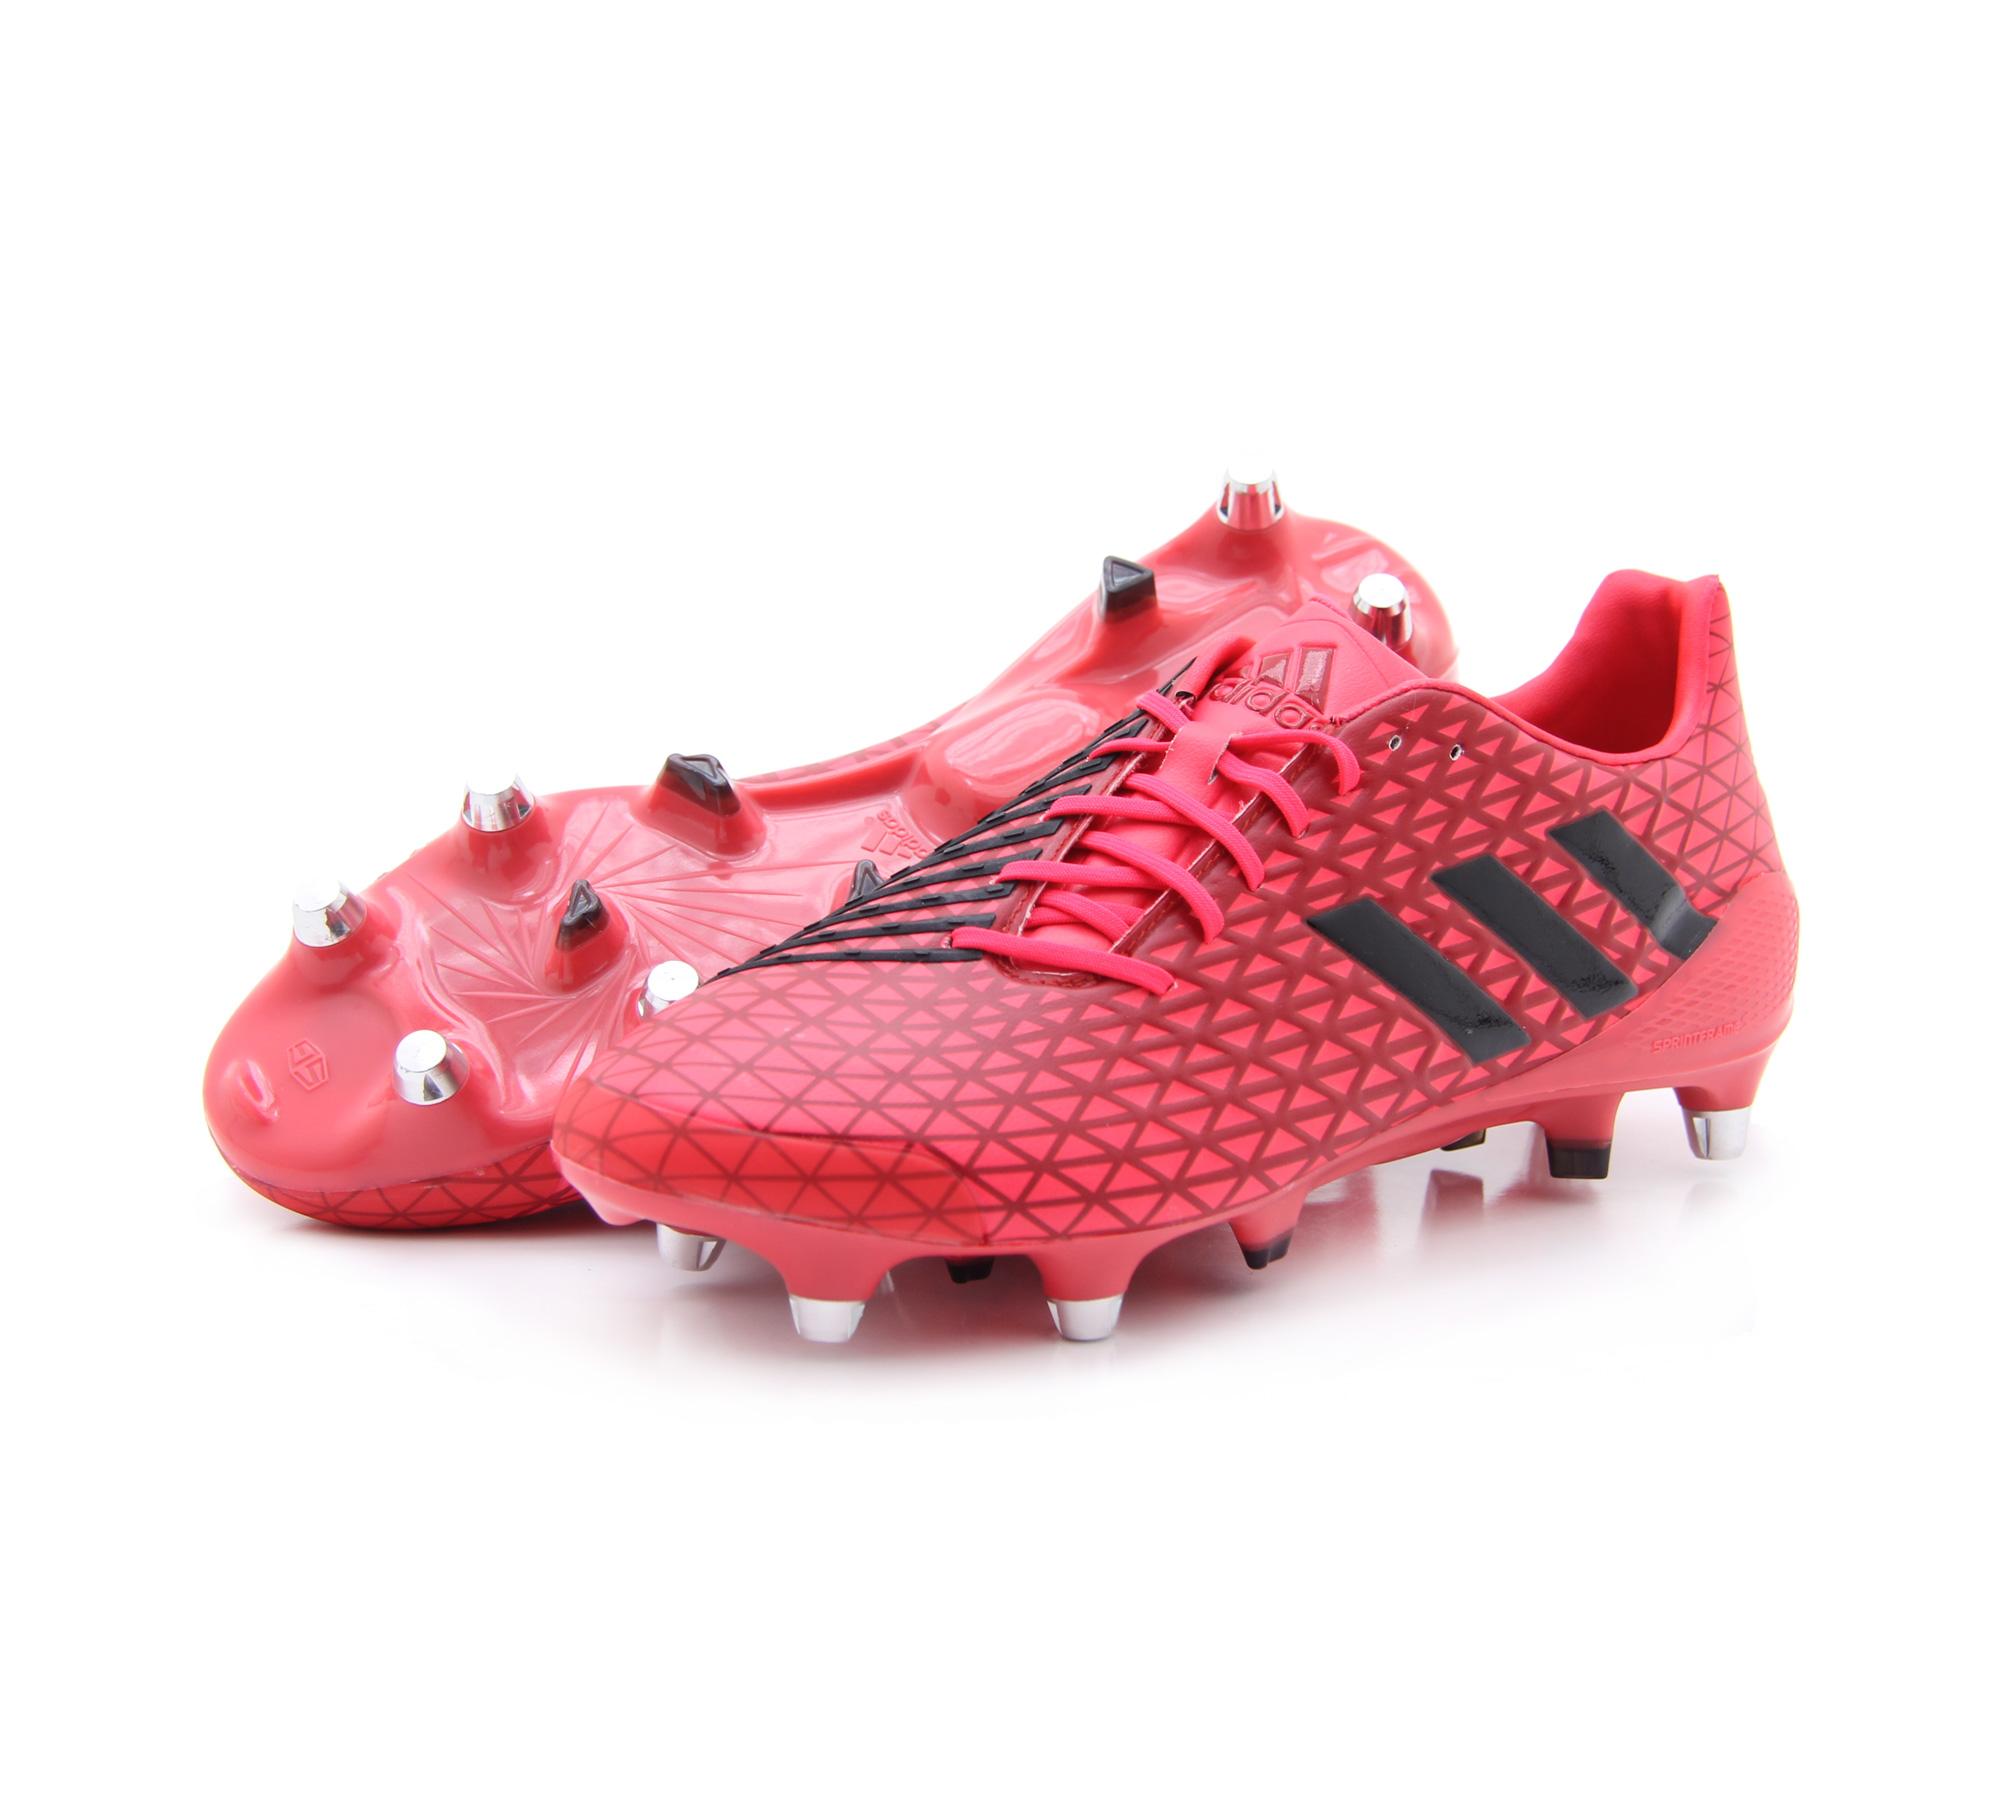 972723cef0c8aa ... shop mens adidas predator malice sg soft ground rugby studs boots red  black aq2055 59f14 acf2f